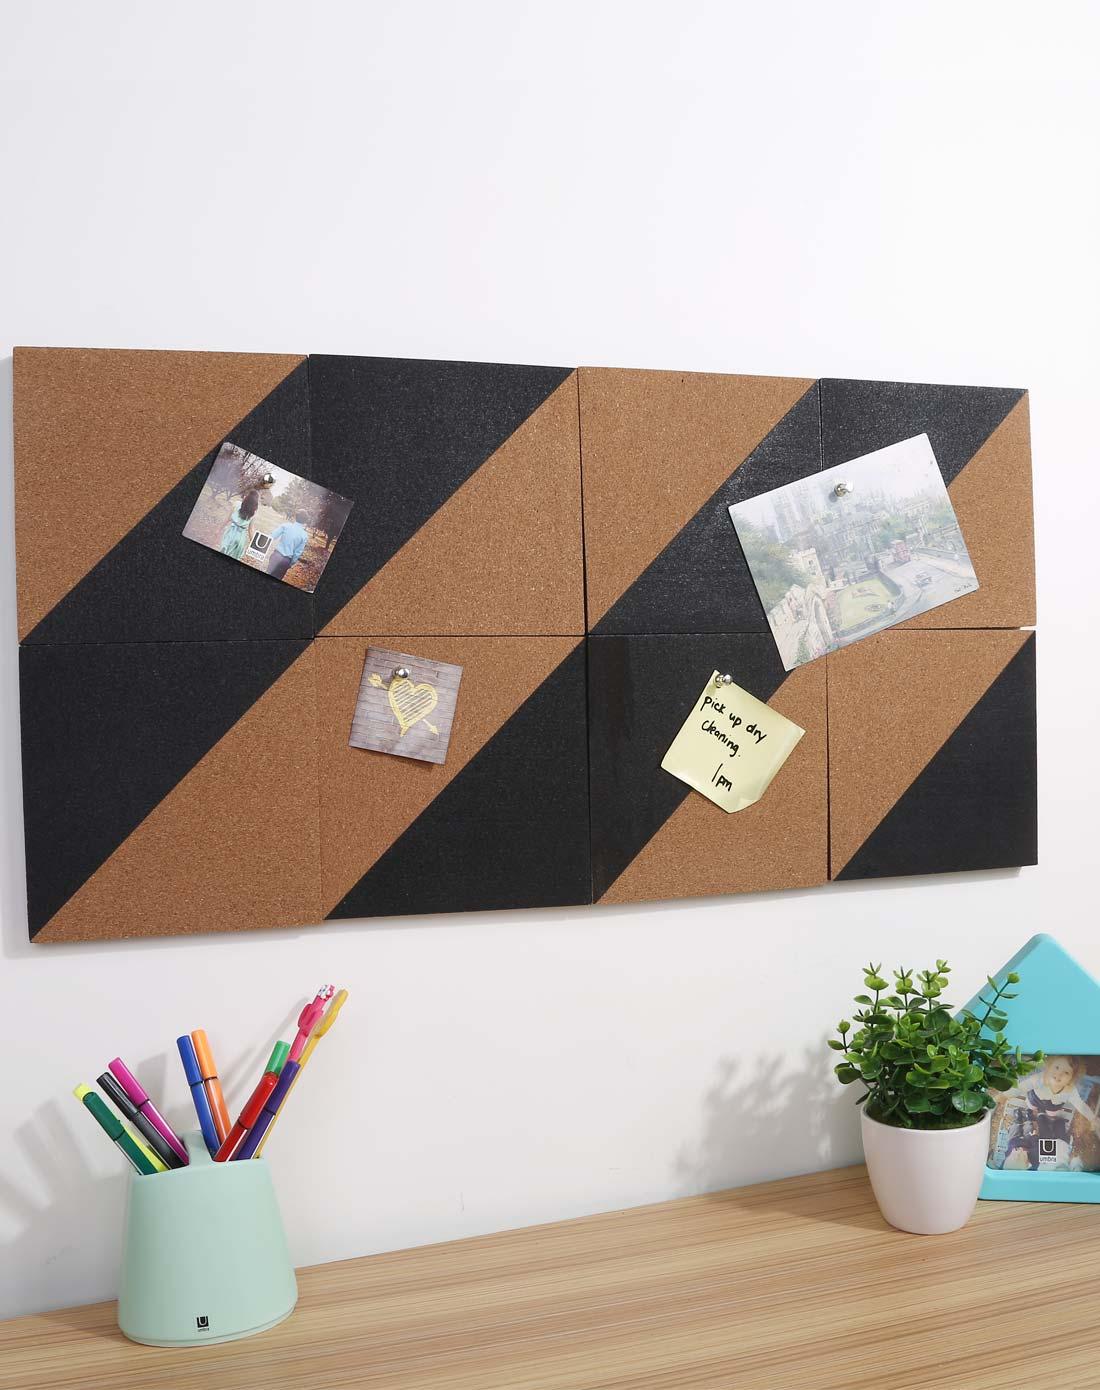 umbra创意家居用品专场图标形软木板公告牌 黑色035